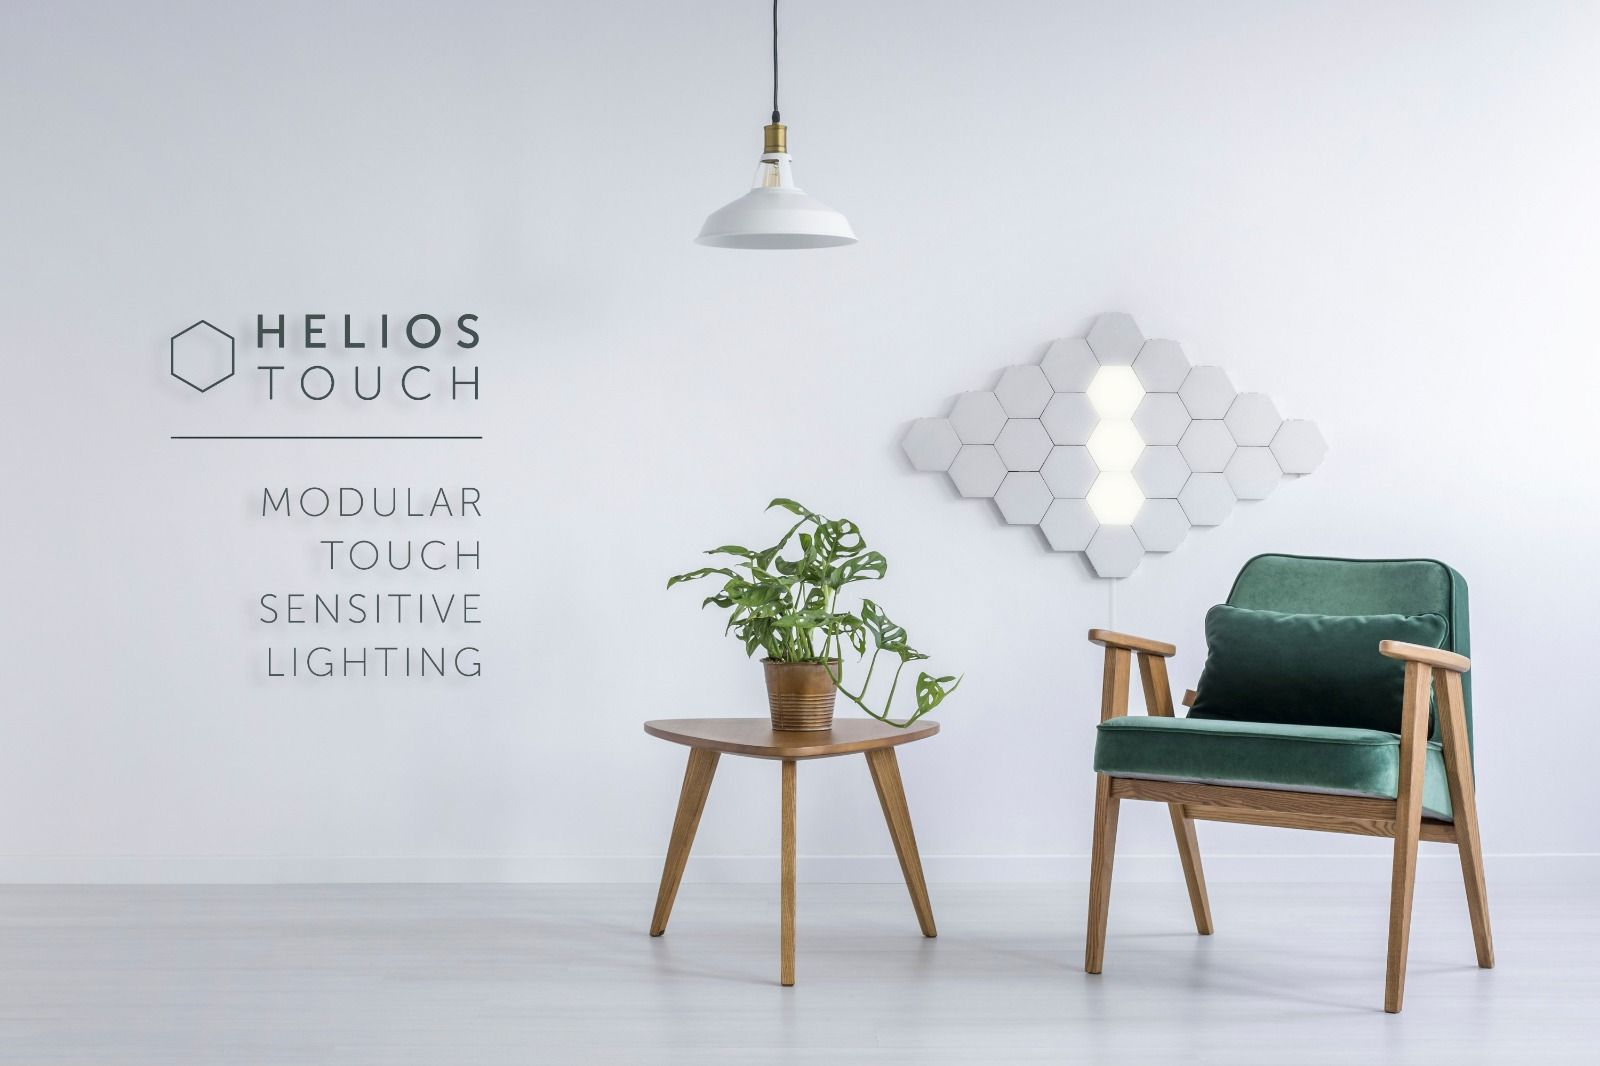 Helios Touch Modular Sensitive Lighting